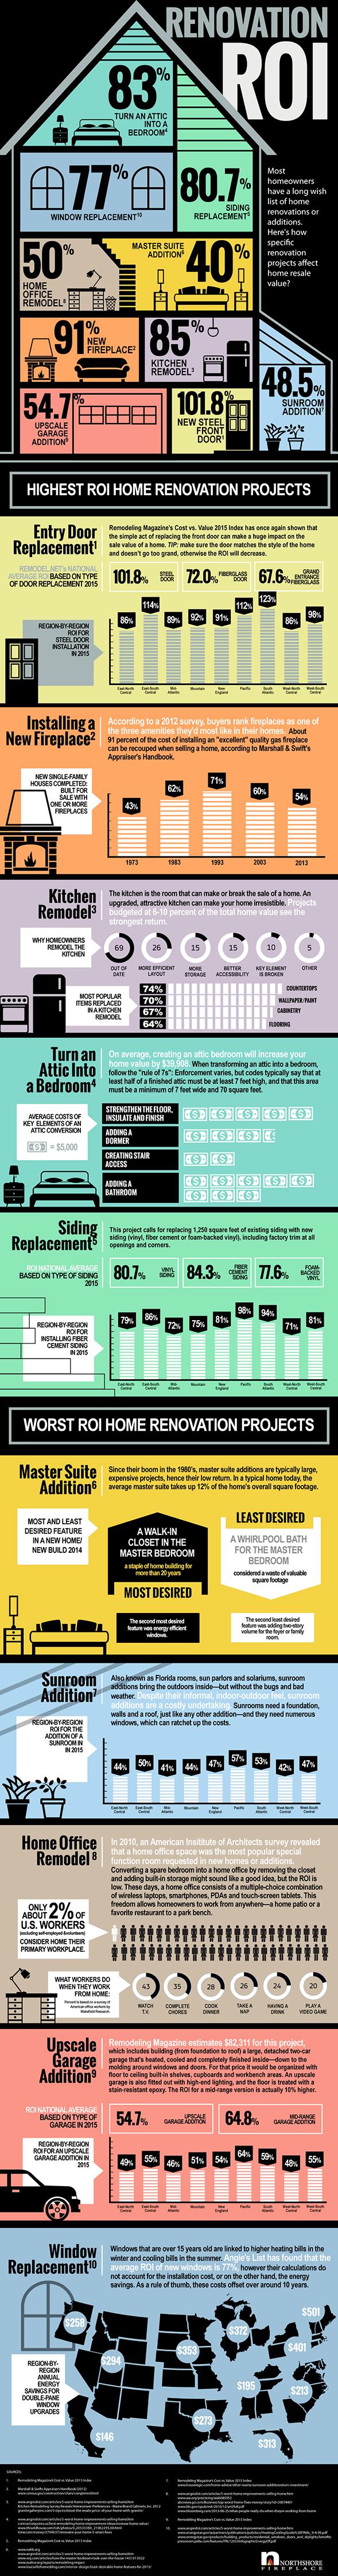 renovation_roi_info